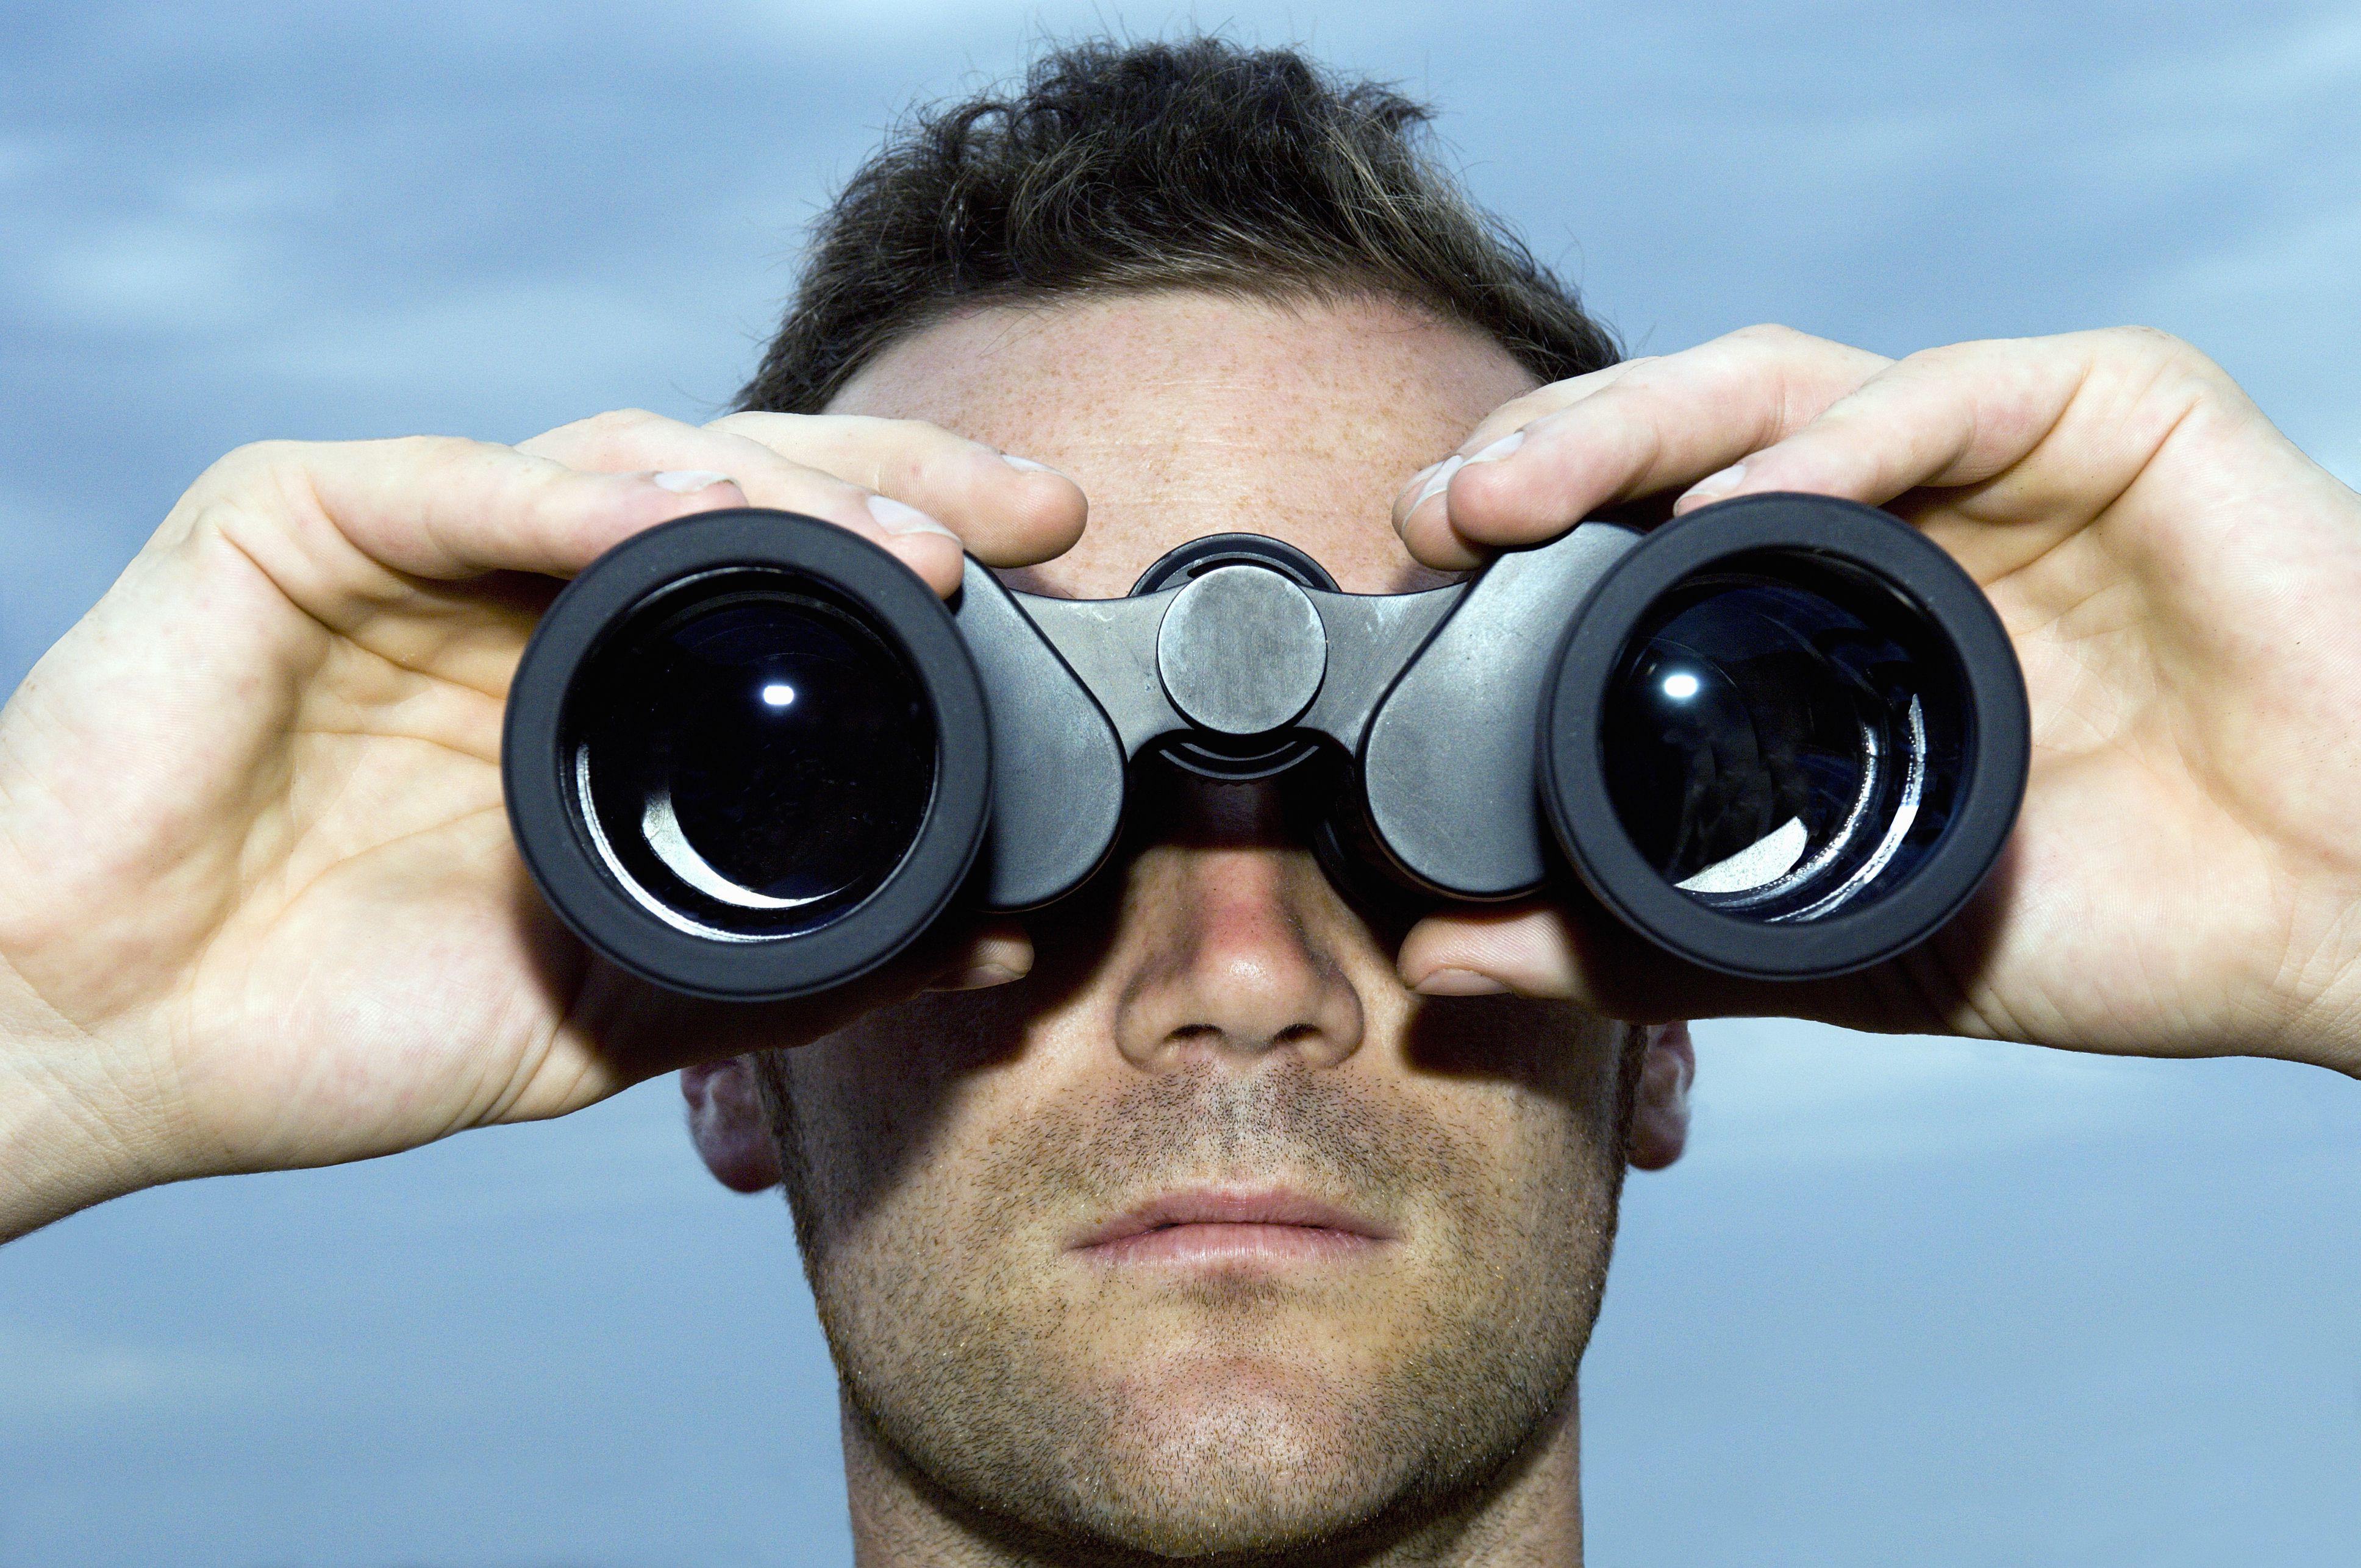 Man looking through binoculars outdoors, close-up